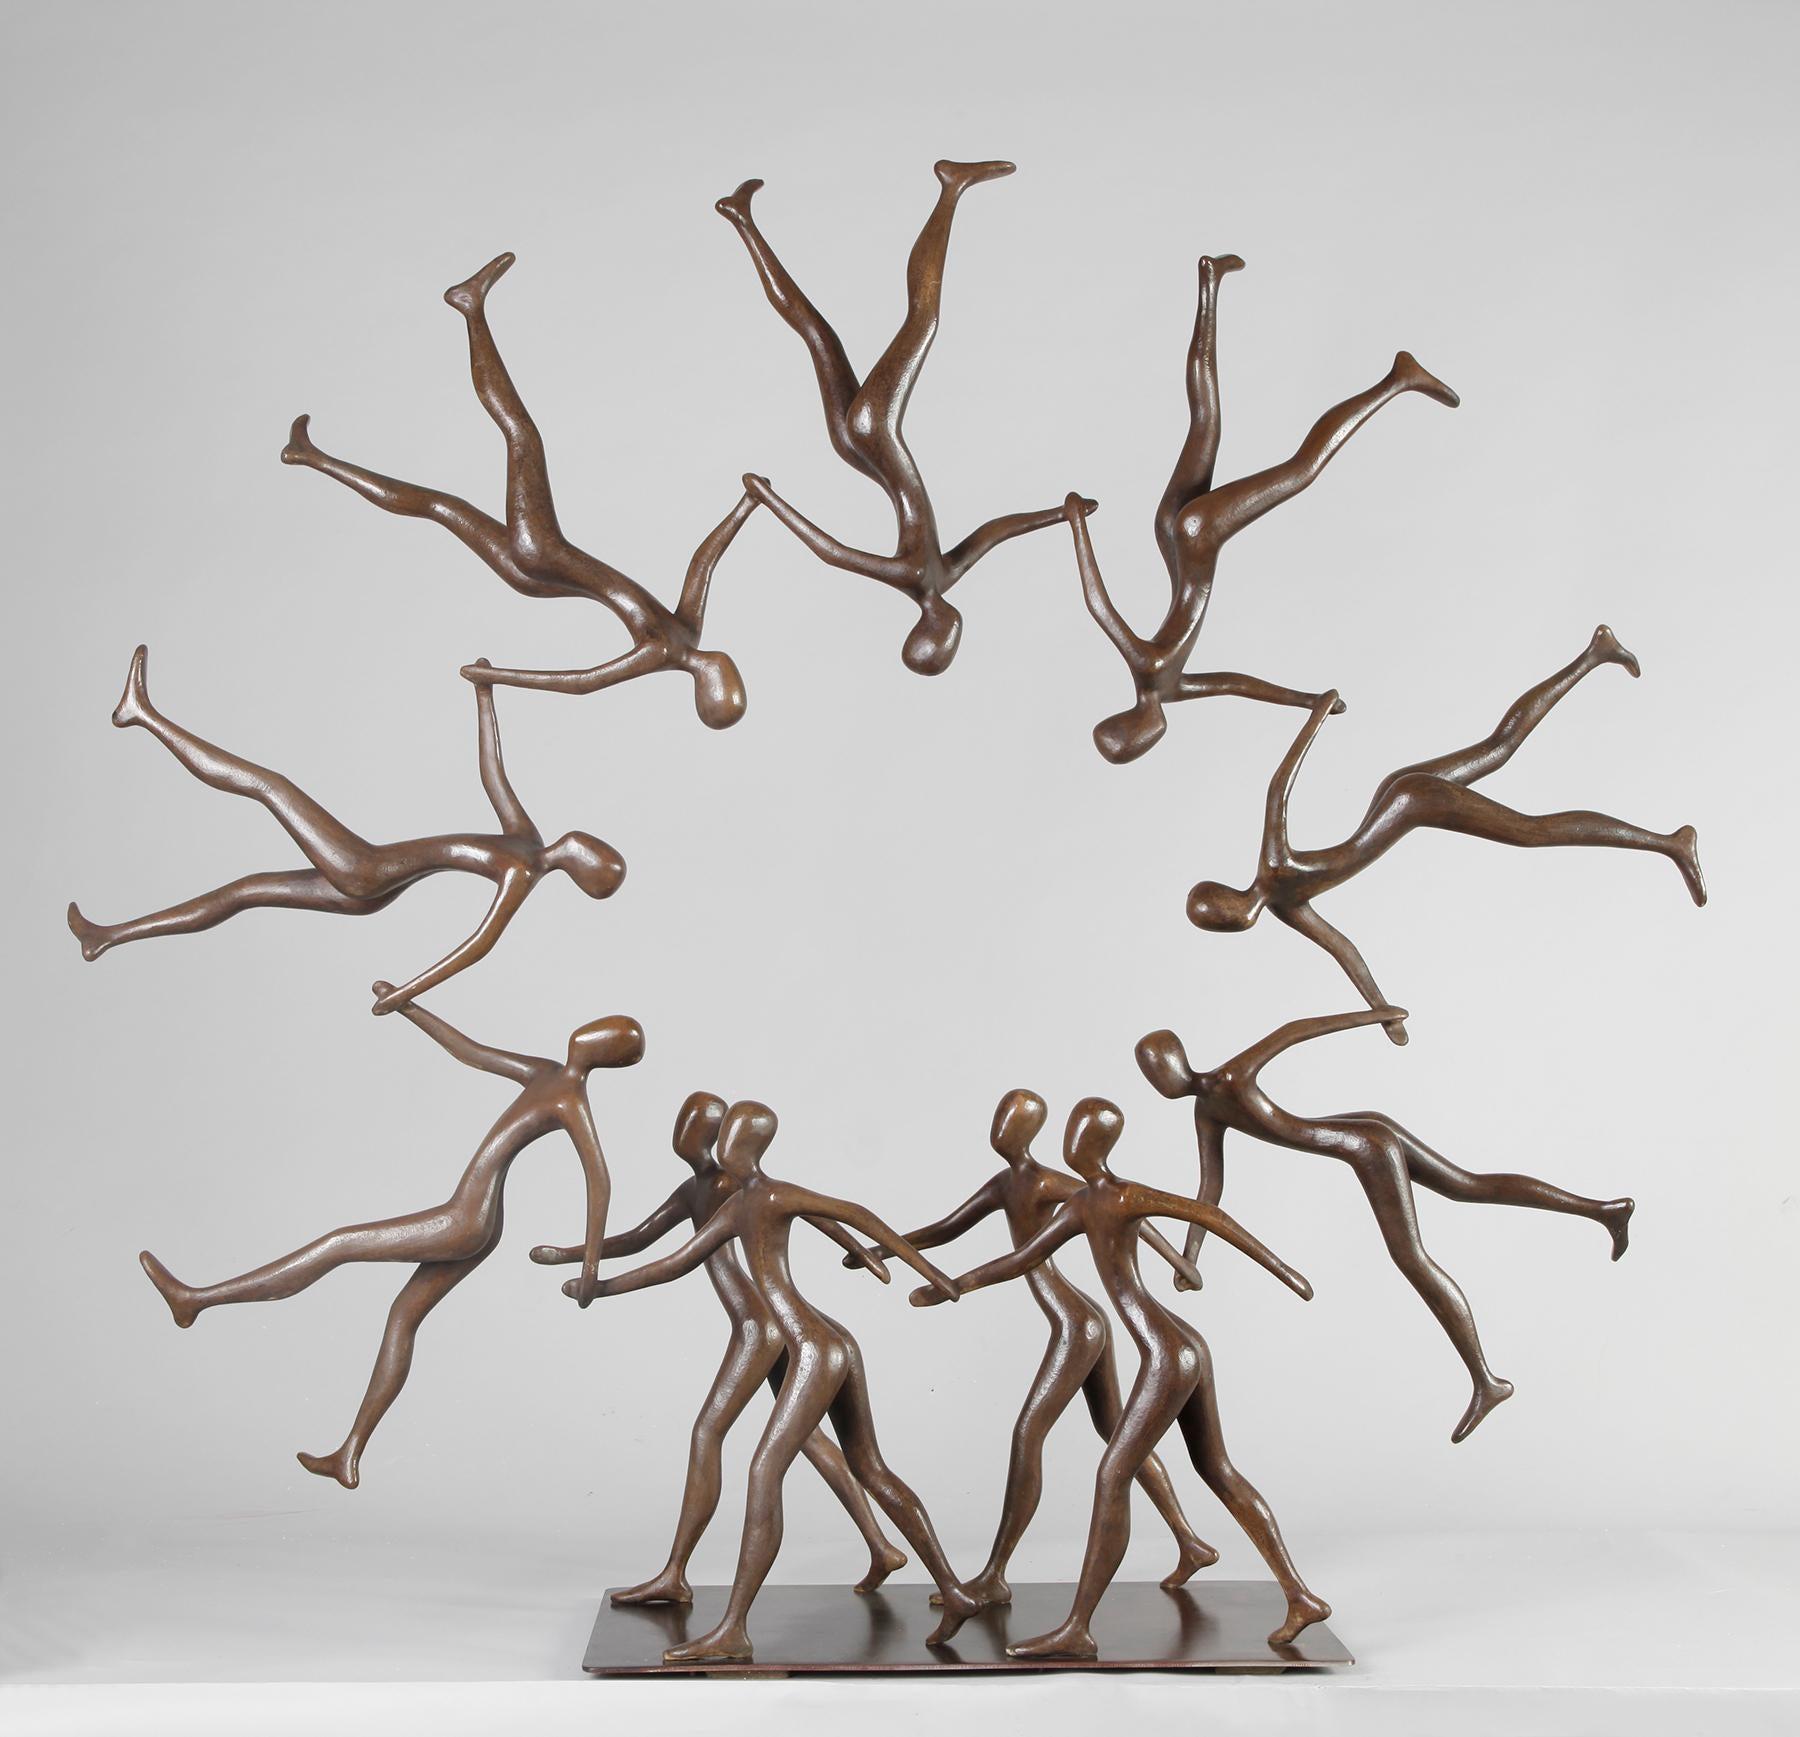 Tolla Inbar, Circle of Life, Bronze sculpture